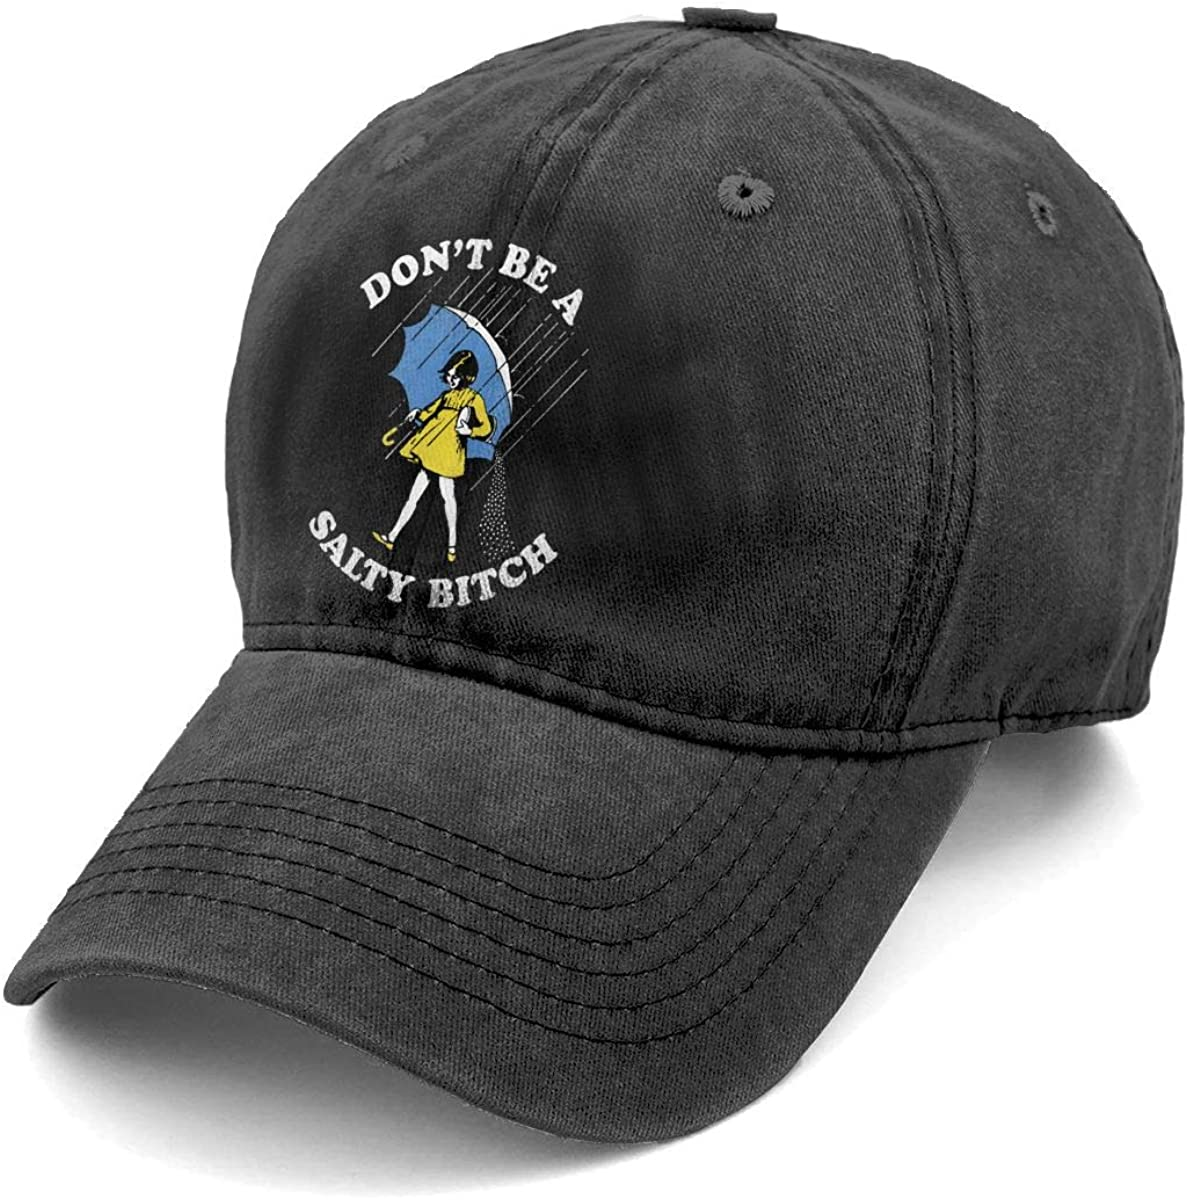 Don't Be A Salty Bitch Personalized Vintage Fashion Men & Women Adjustable Denim Dad Hat Cotton Baseball Cap Black